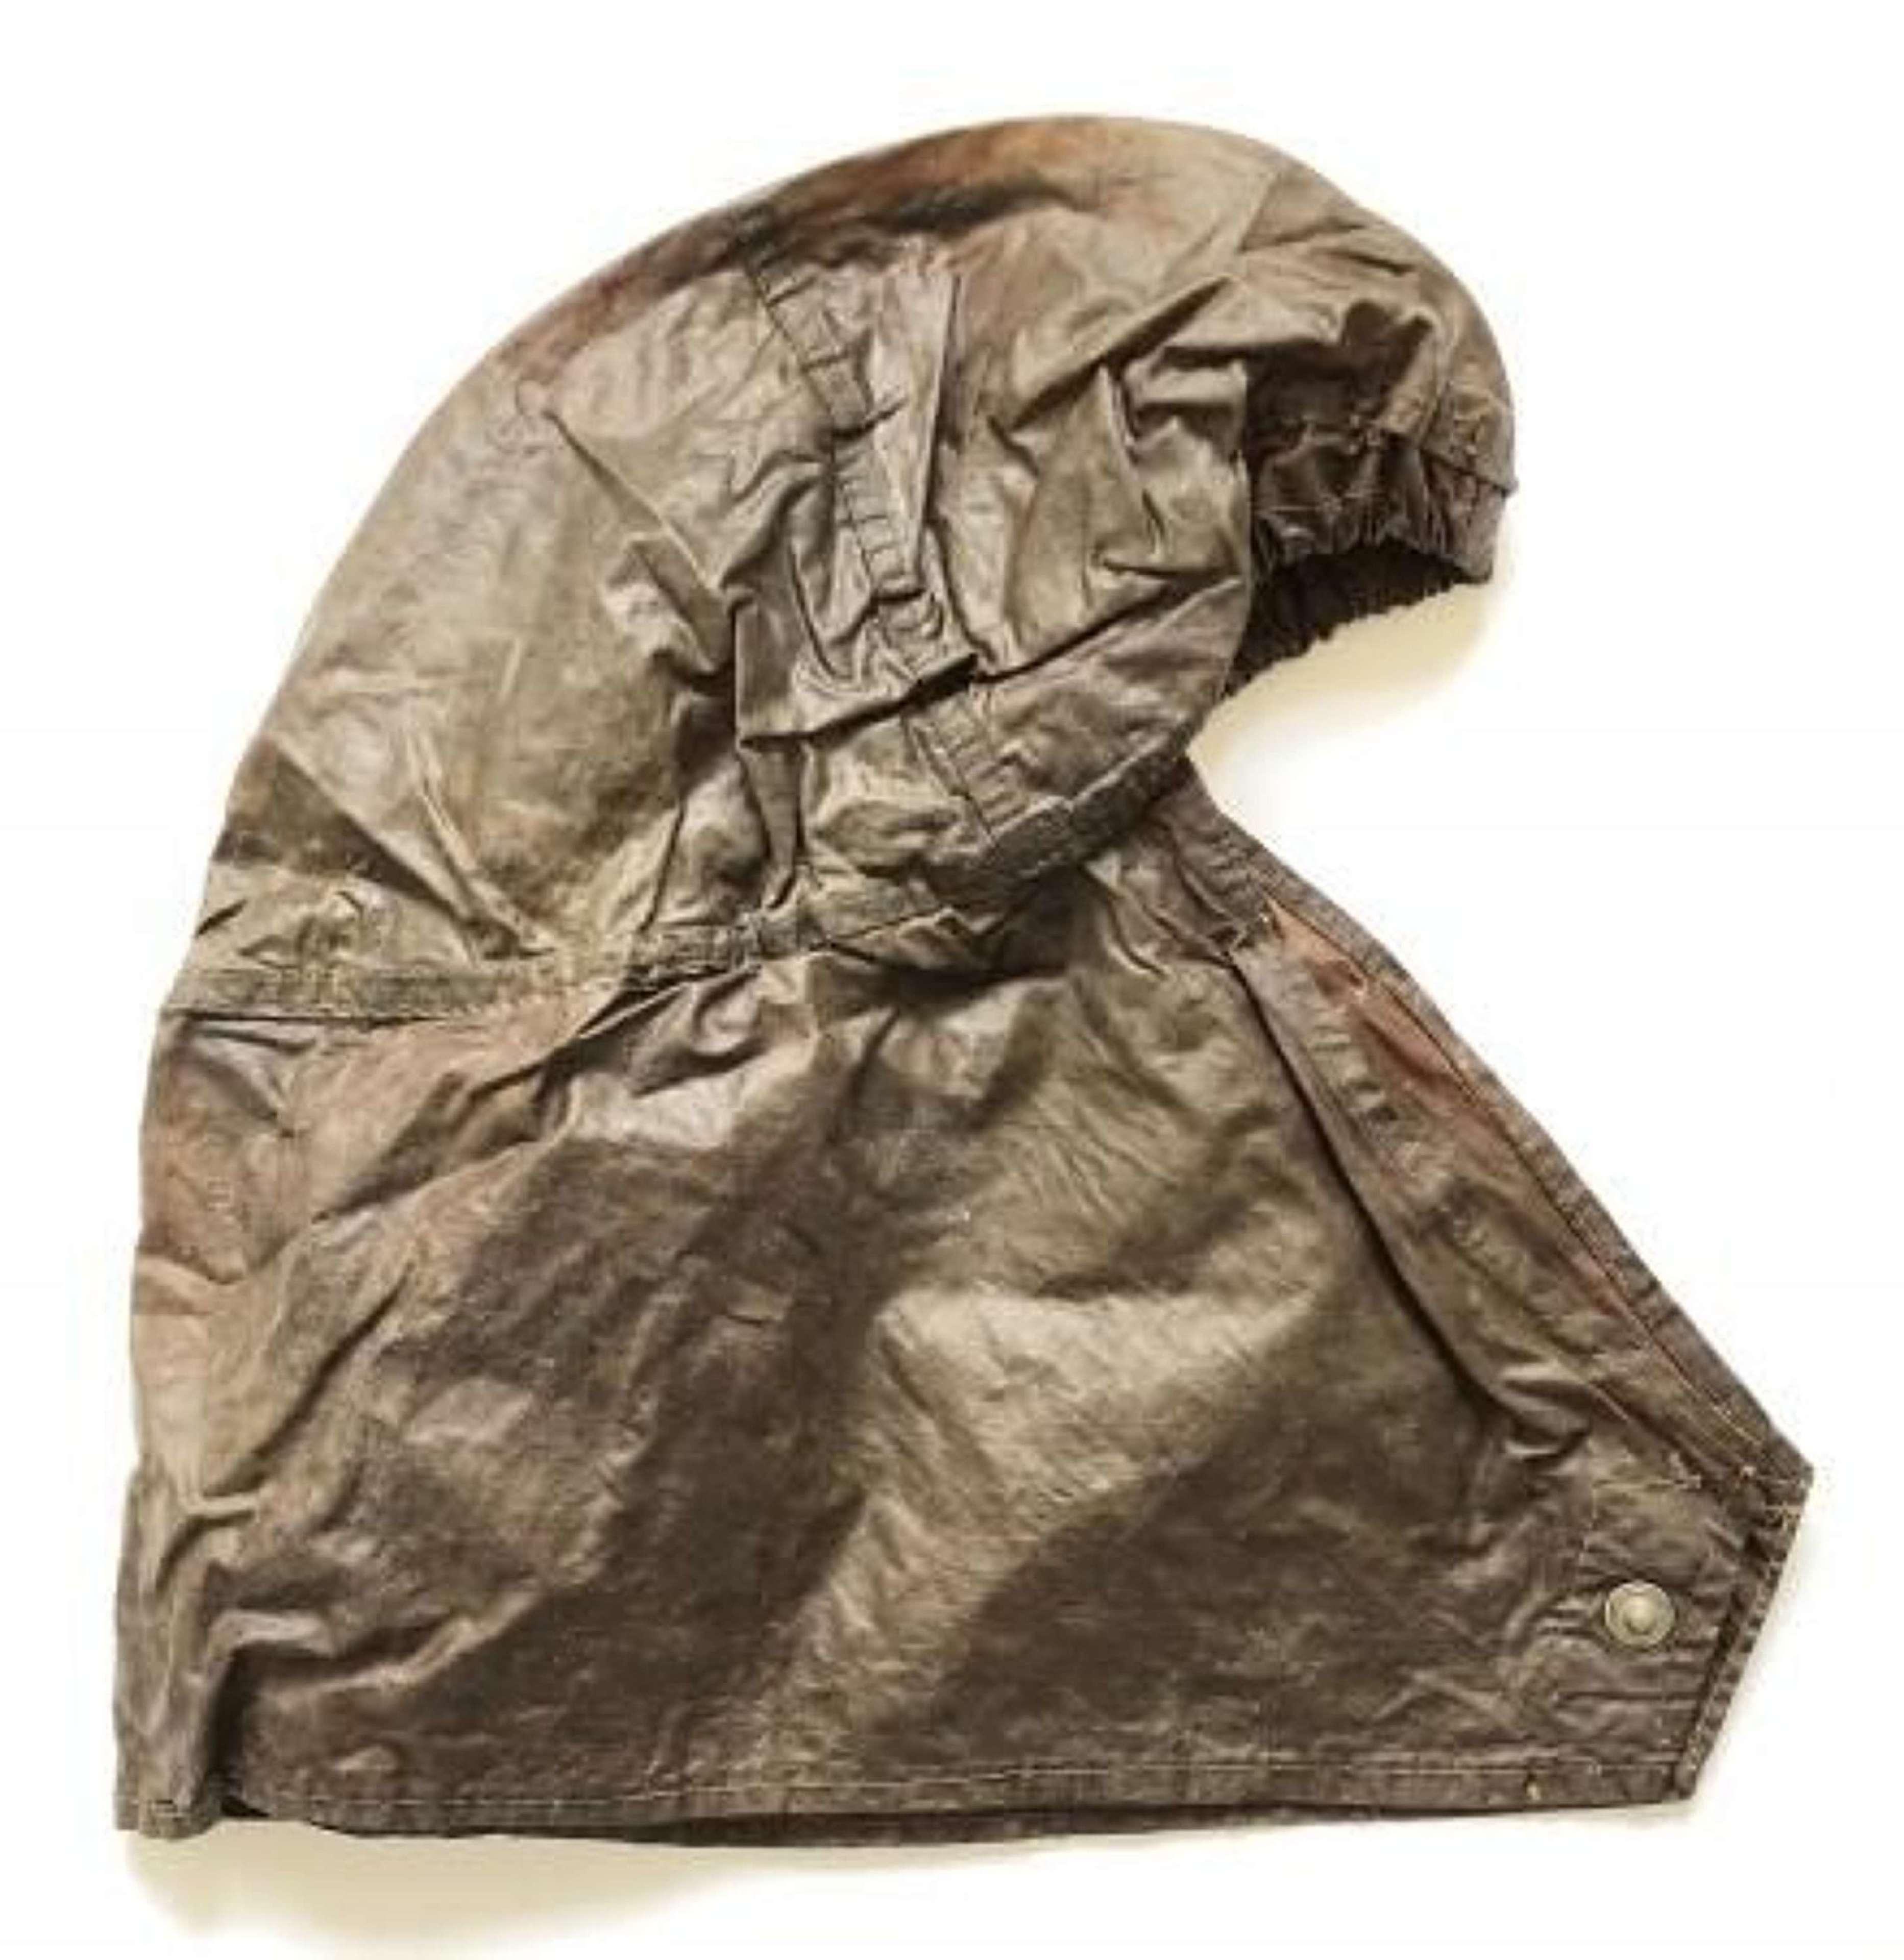 WW2 British Anti Gas Helmet Cover.